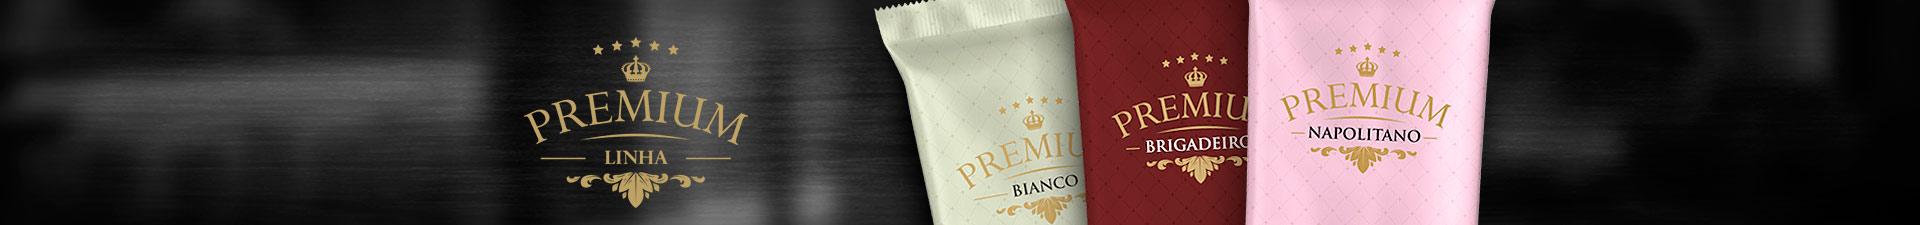 banner_premium_interno